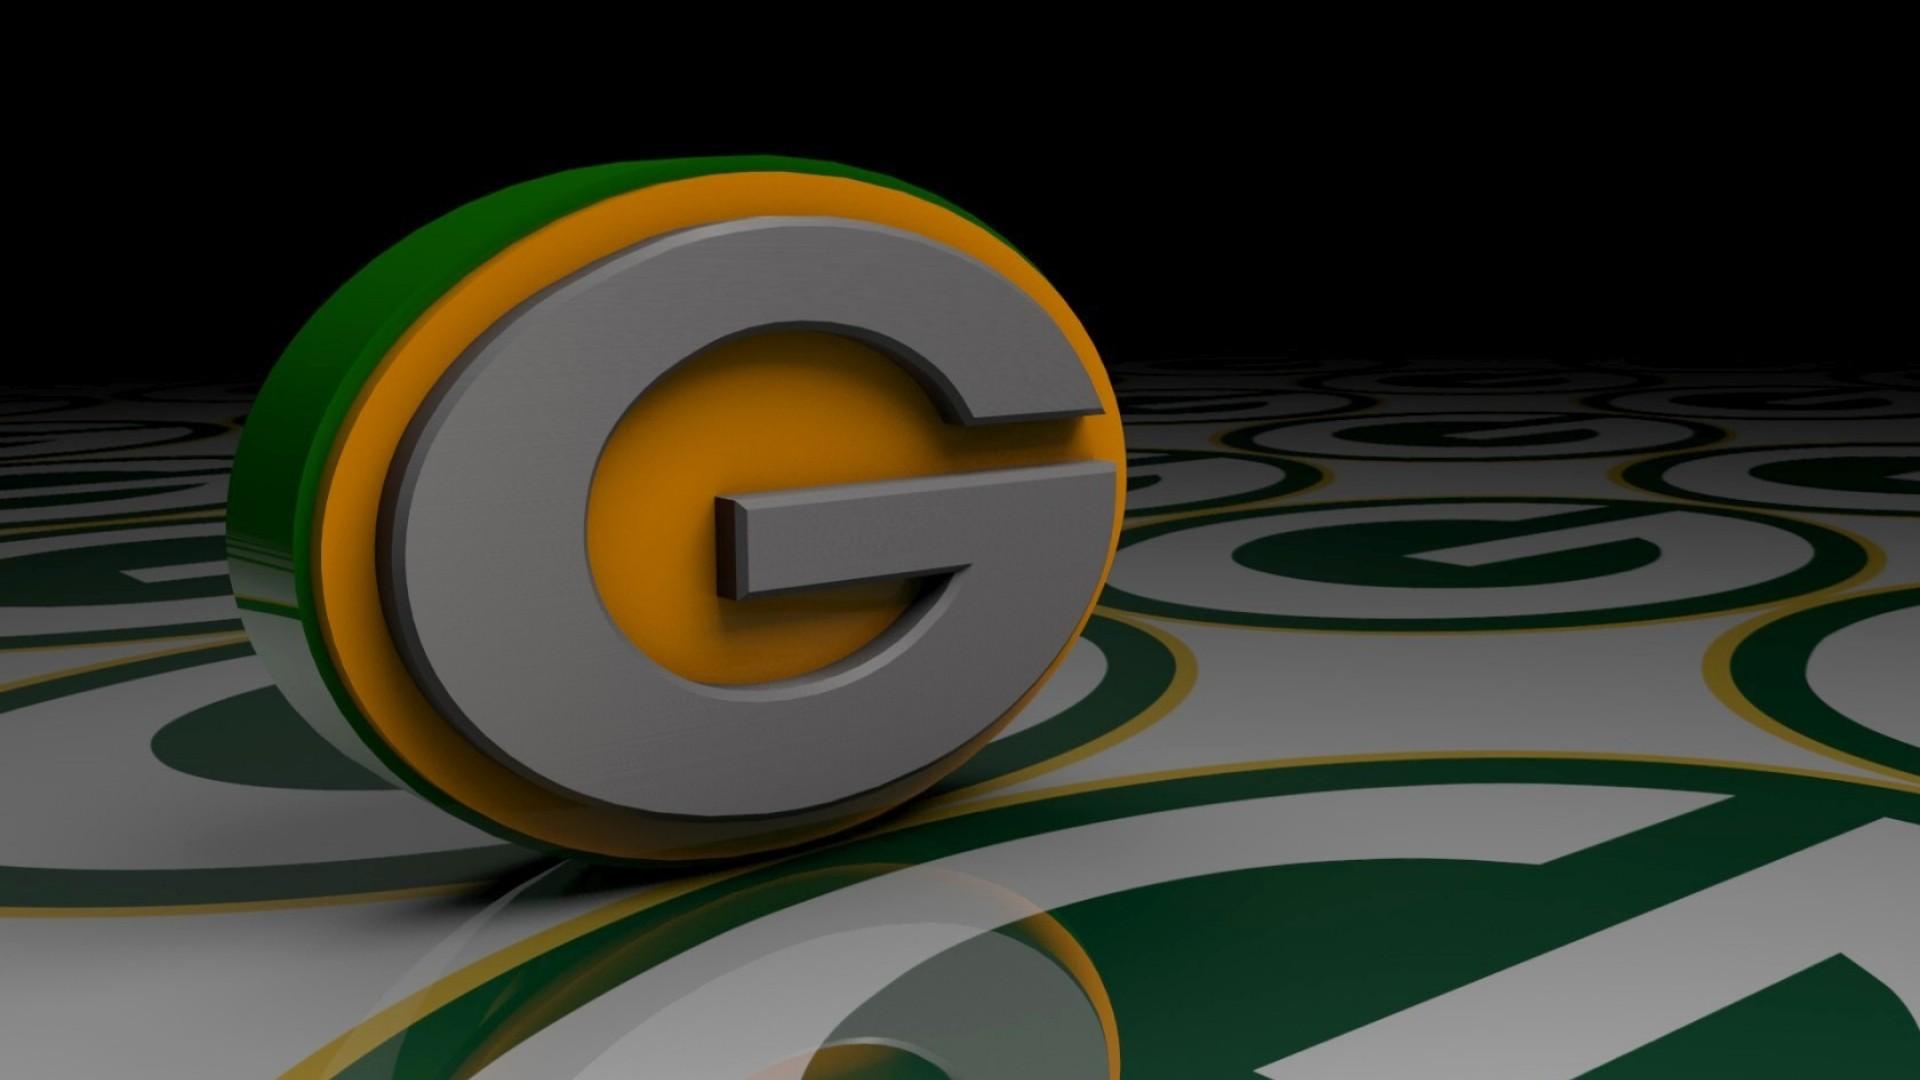 Green-Bay-Packers-Download-HD-Pinterest-wallpaper-wpc5805556